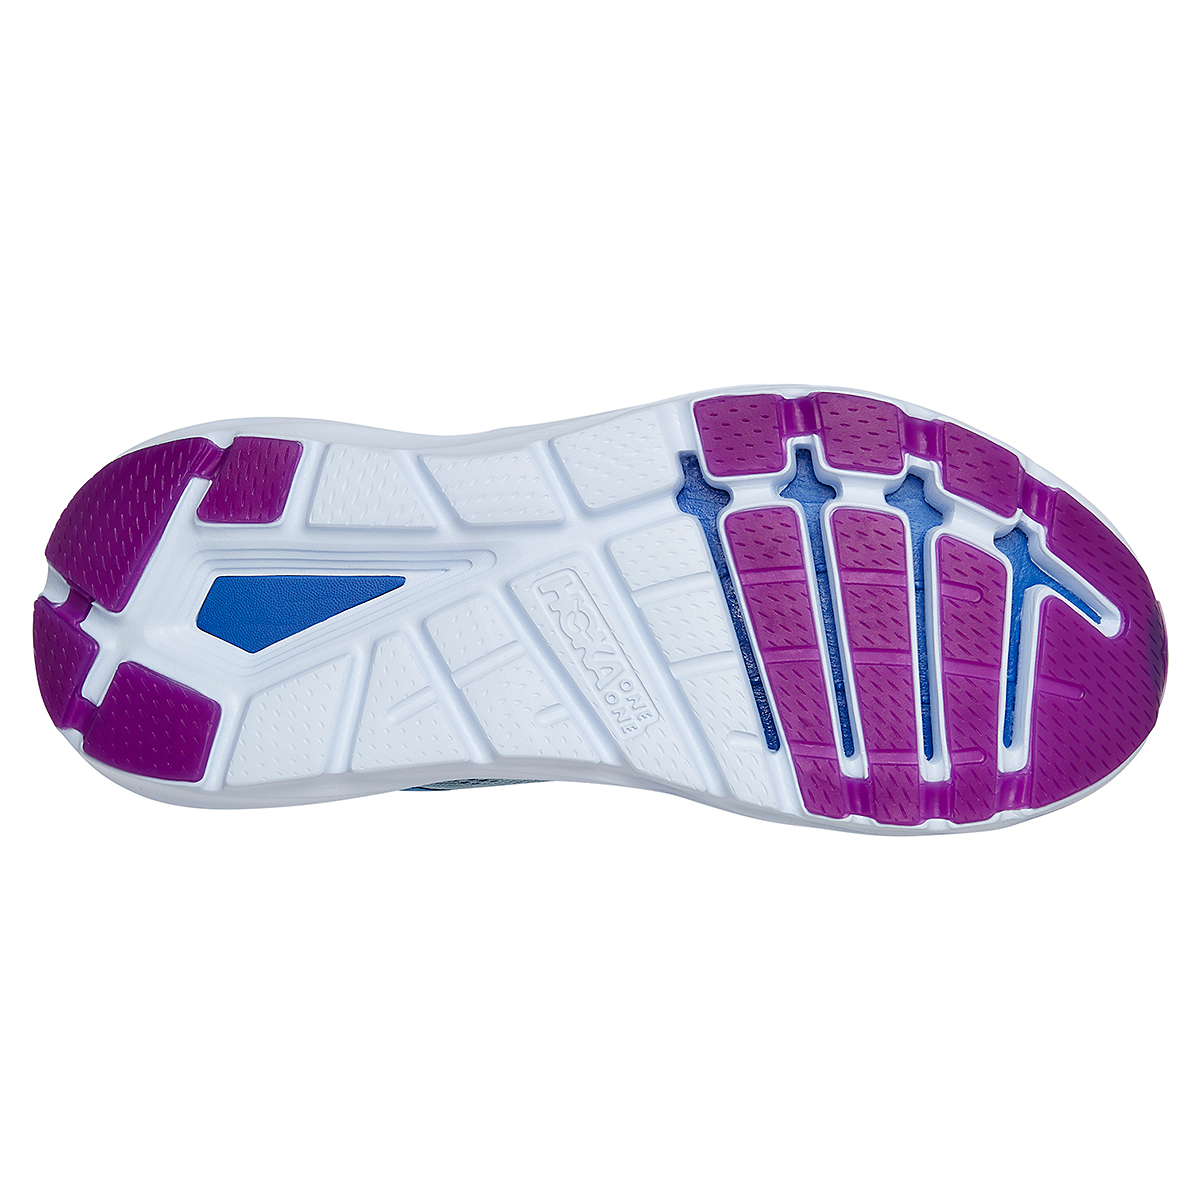 Women's Hoka One One Elevon 2 Running Shoe - Color: Ballad Blue - Size: 5 - Width: Regular, Ballad Blue, large, image 6